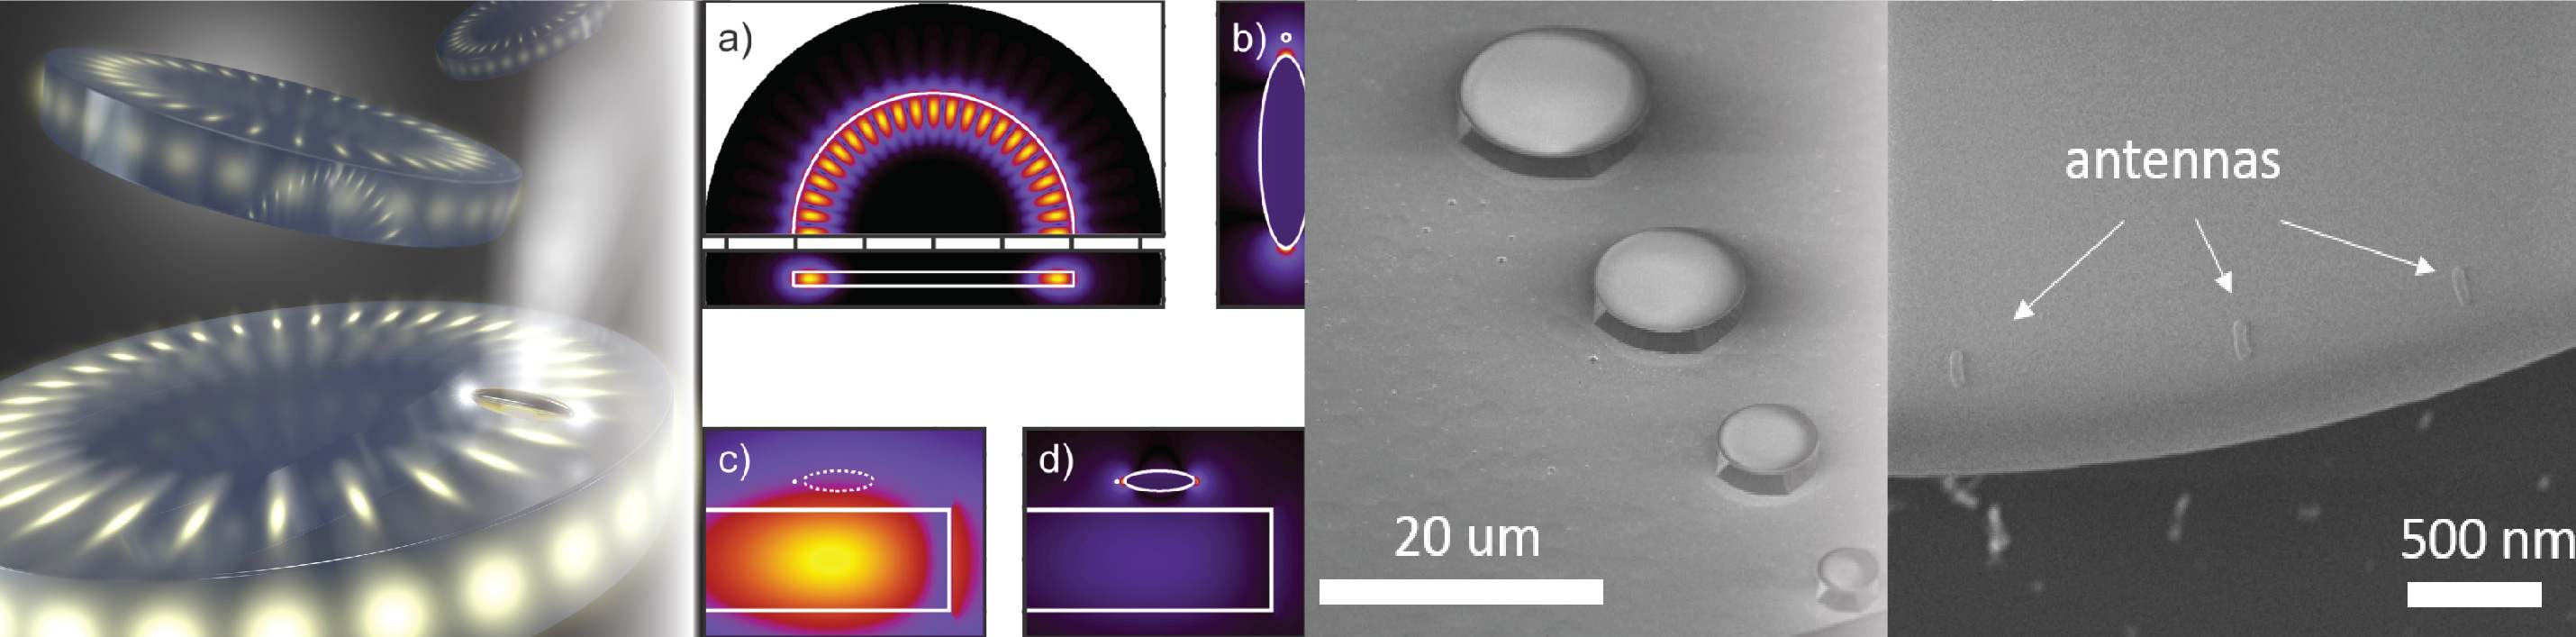 Hybrid nanophotonic architectures